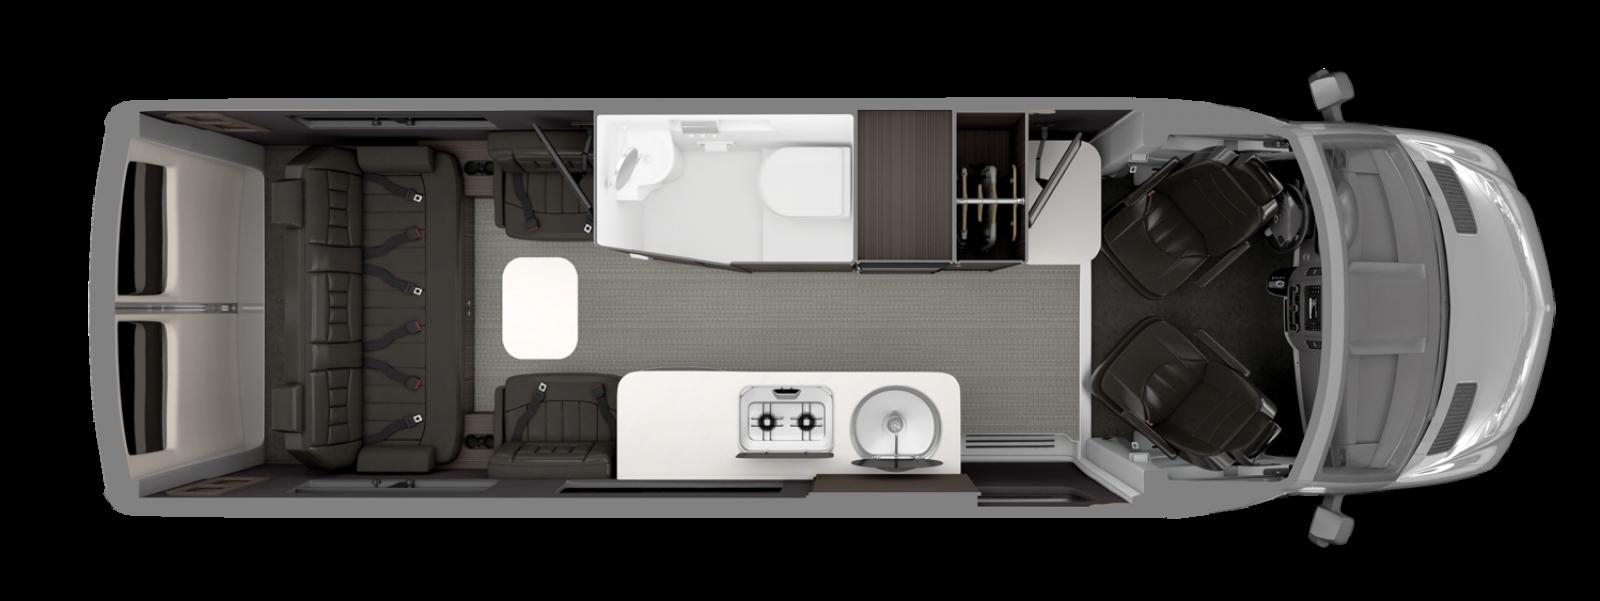 Airstream Interstate Grand Tour EXT Floorplan Formal Black